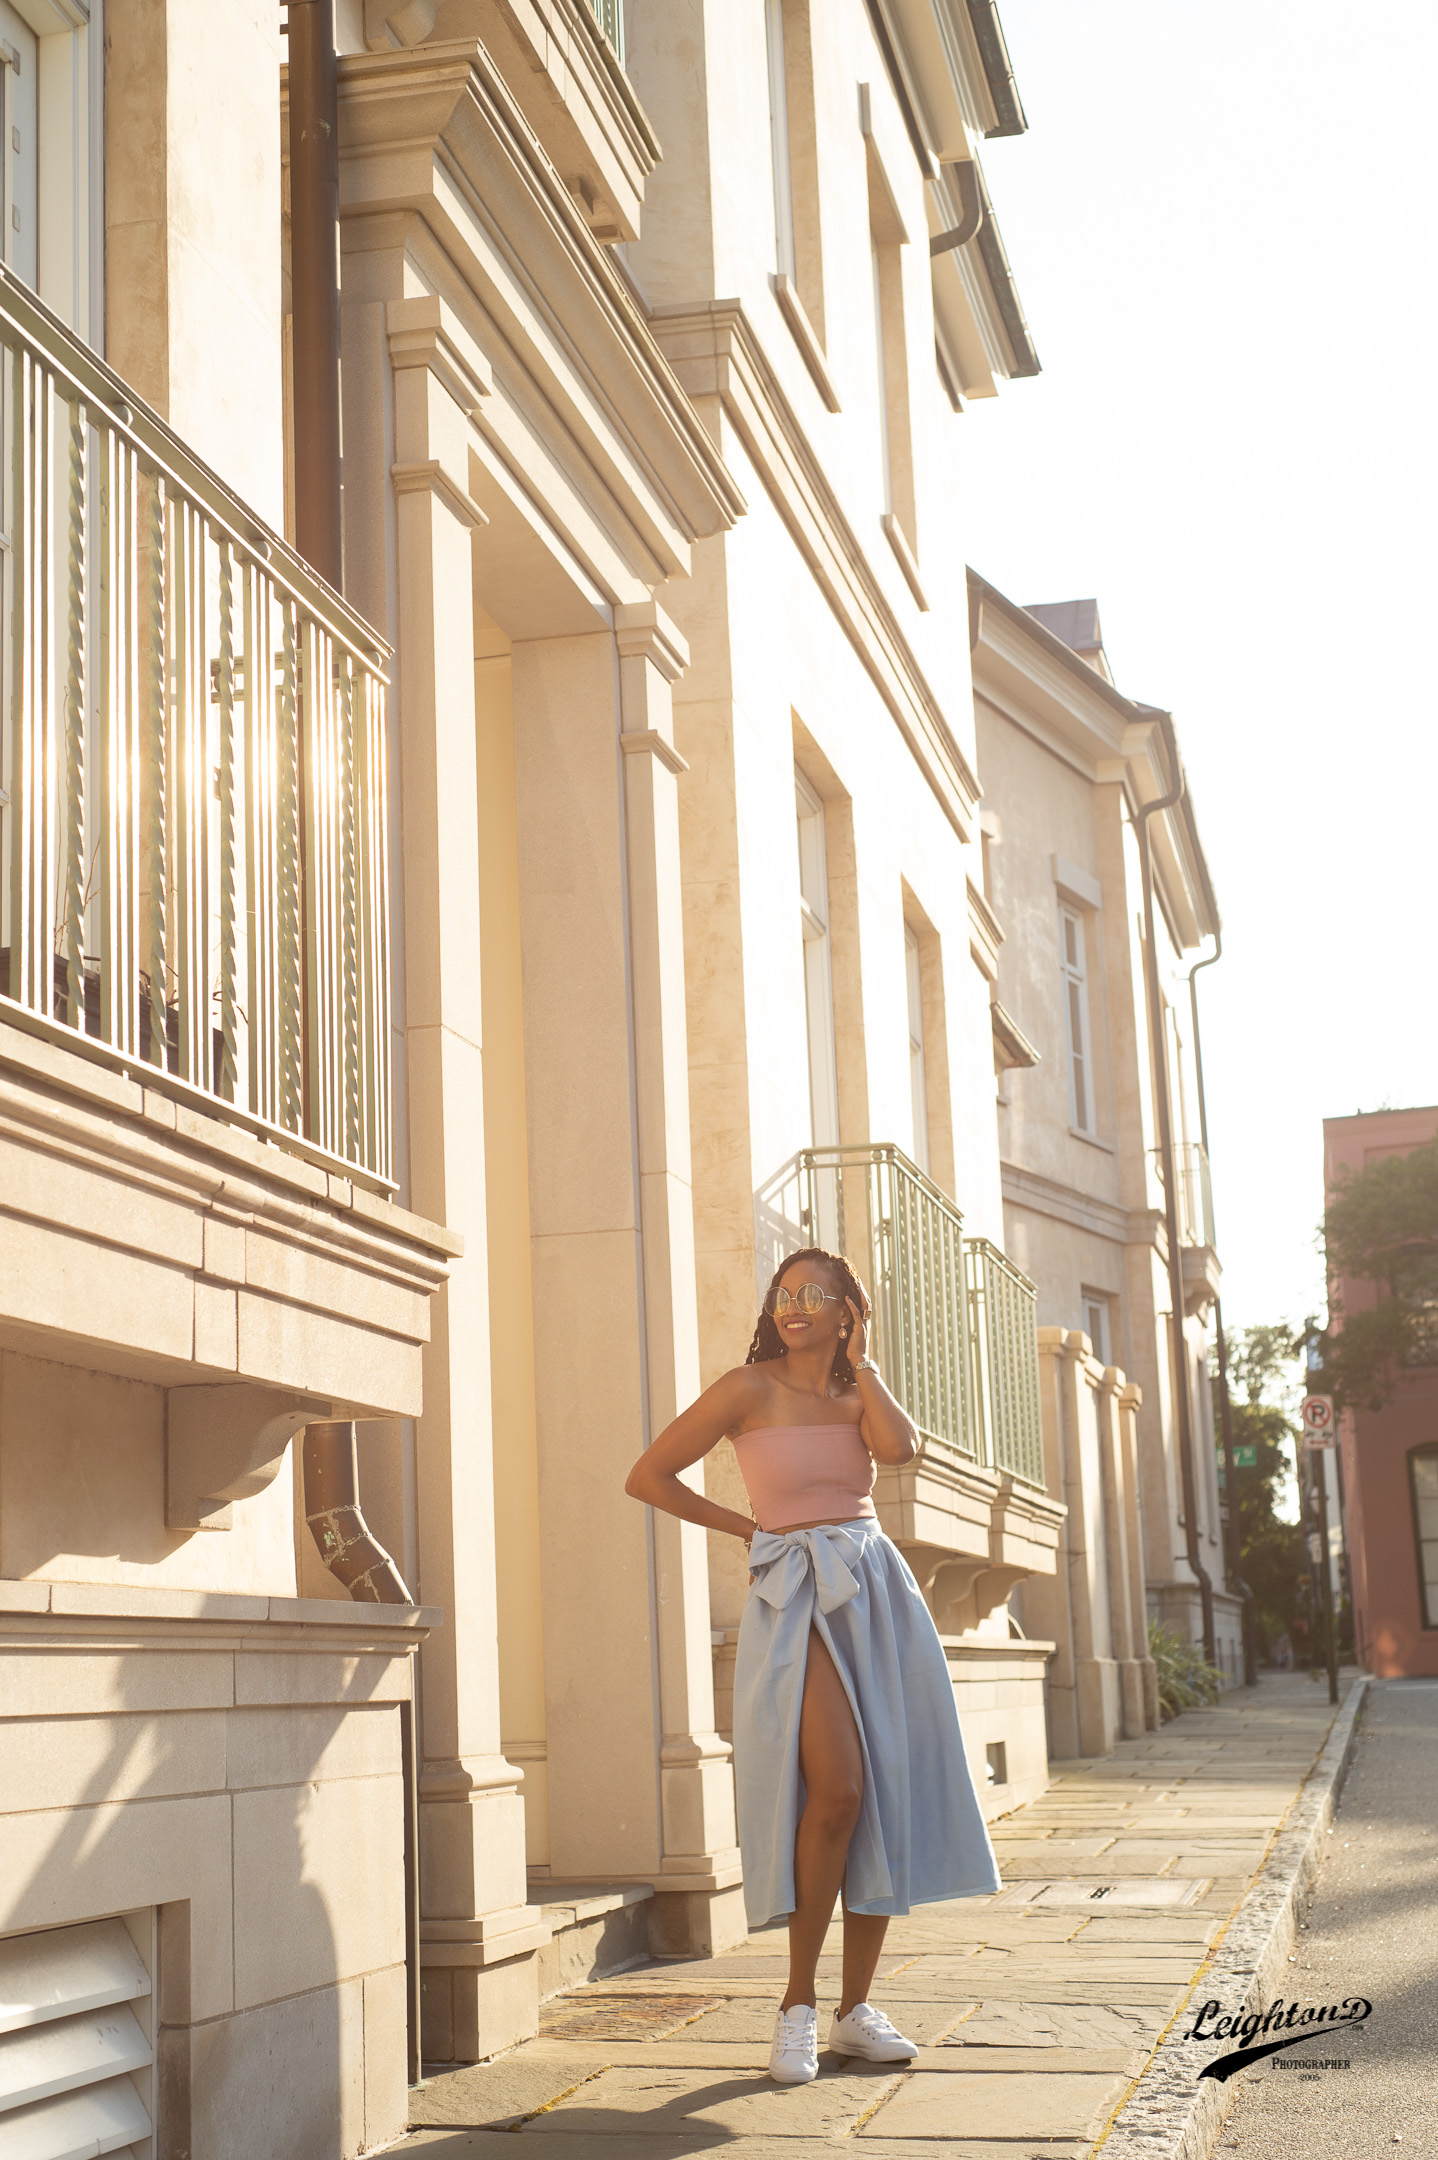 Phee enjoying picturesque downtown Charleston, SC.